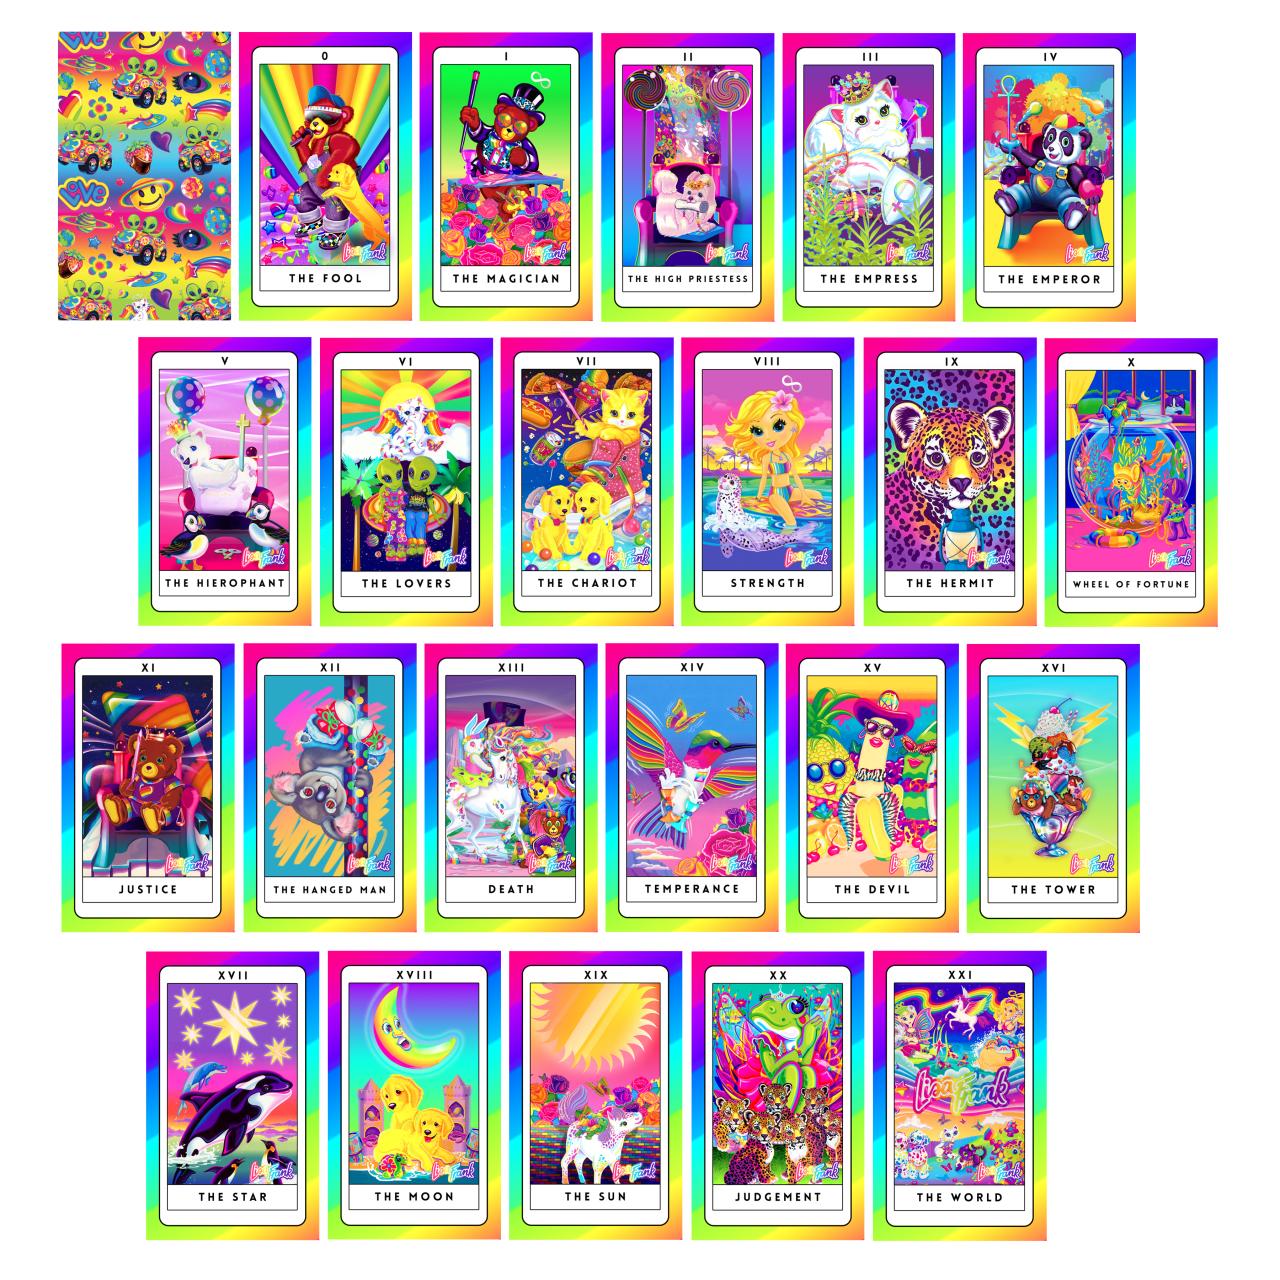 Printable Tarot Cards - Printable Cards - Printable Tarot Cards Pdf Free